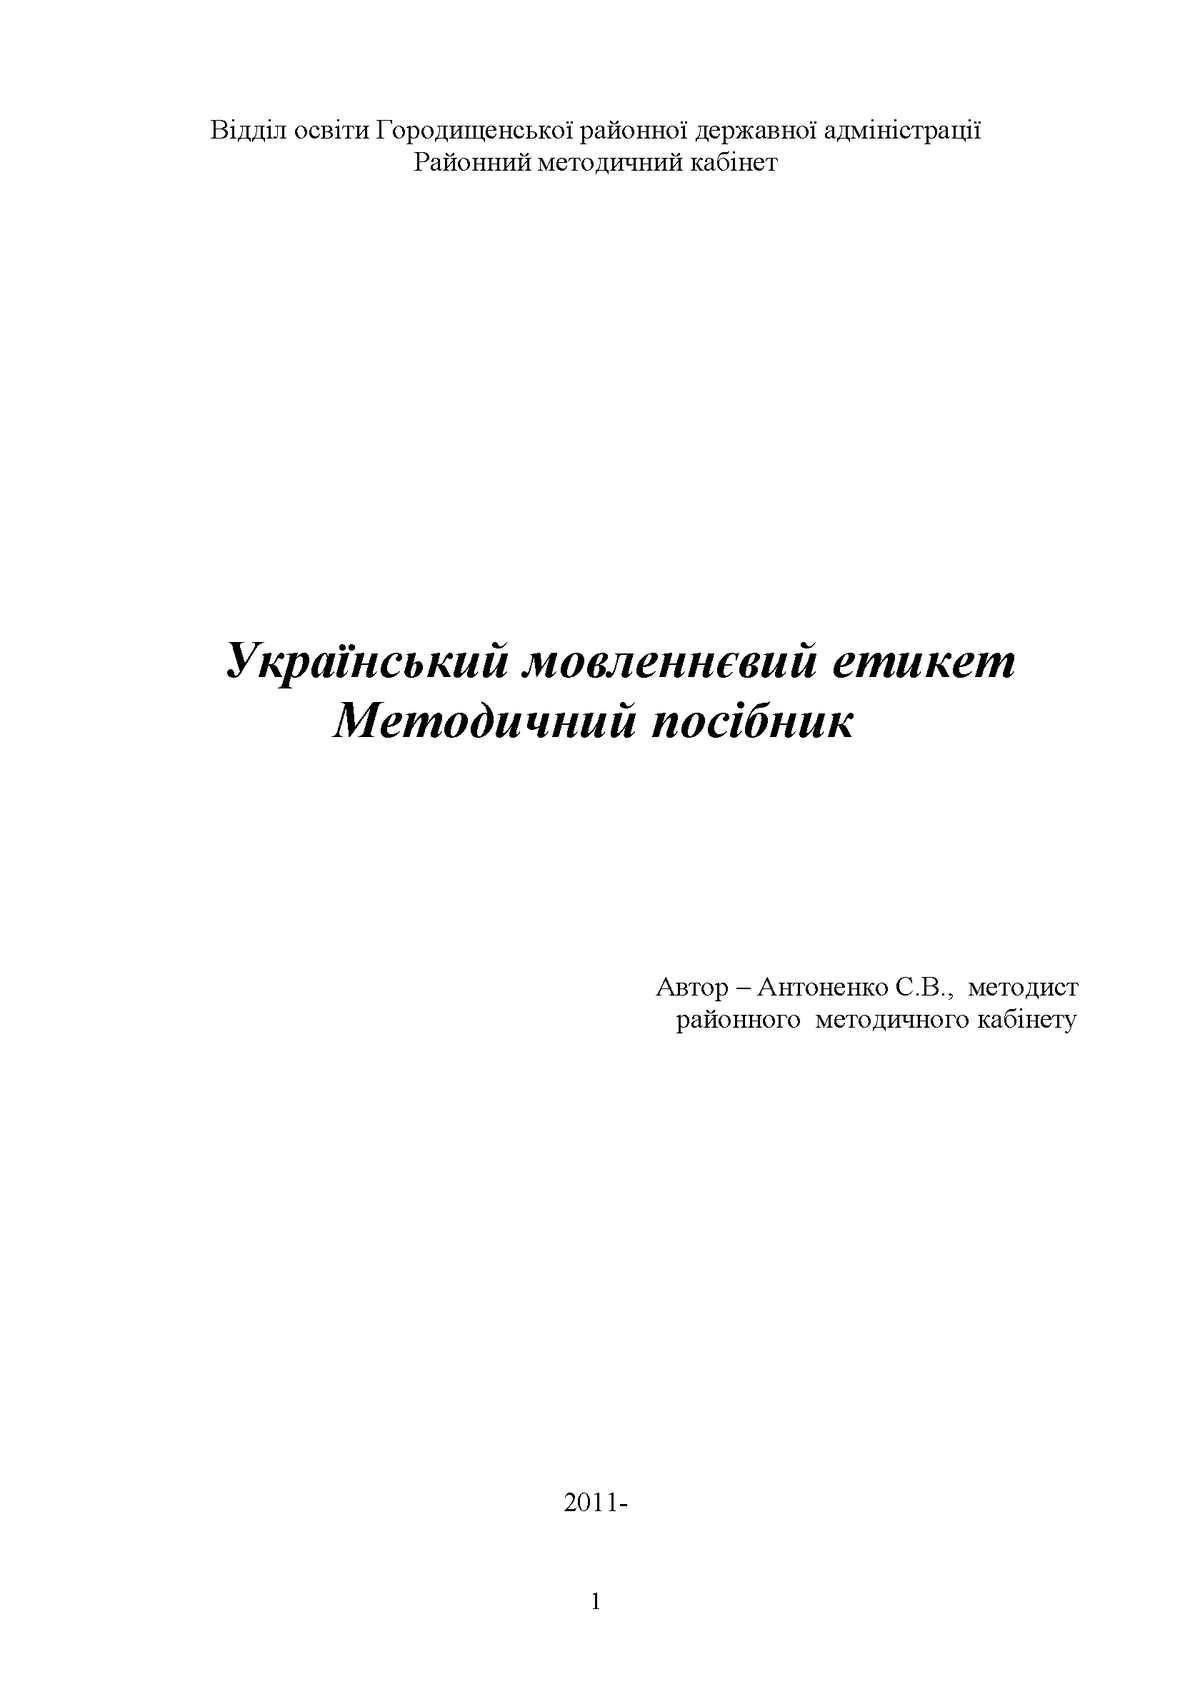 Calaméo - Синюта Укр мовлен етикет 9ba731bac7724